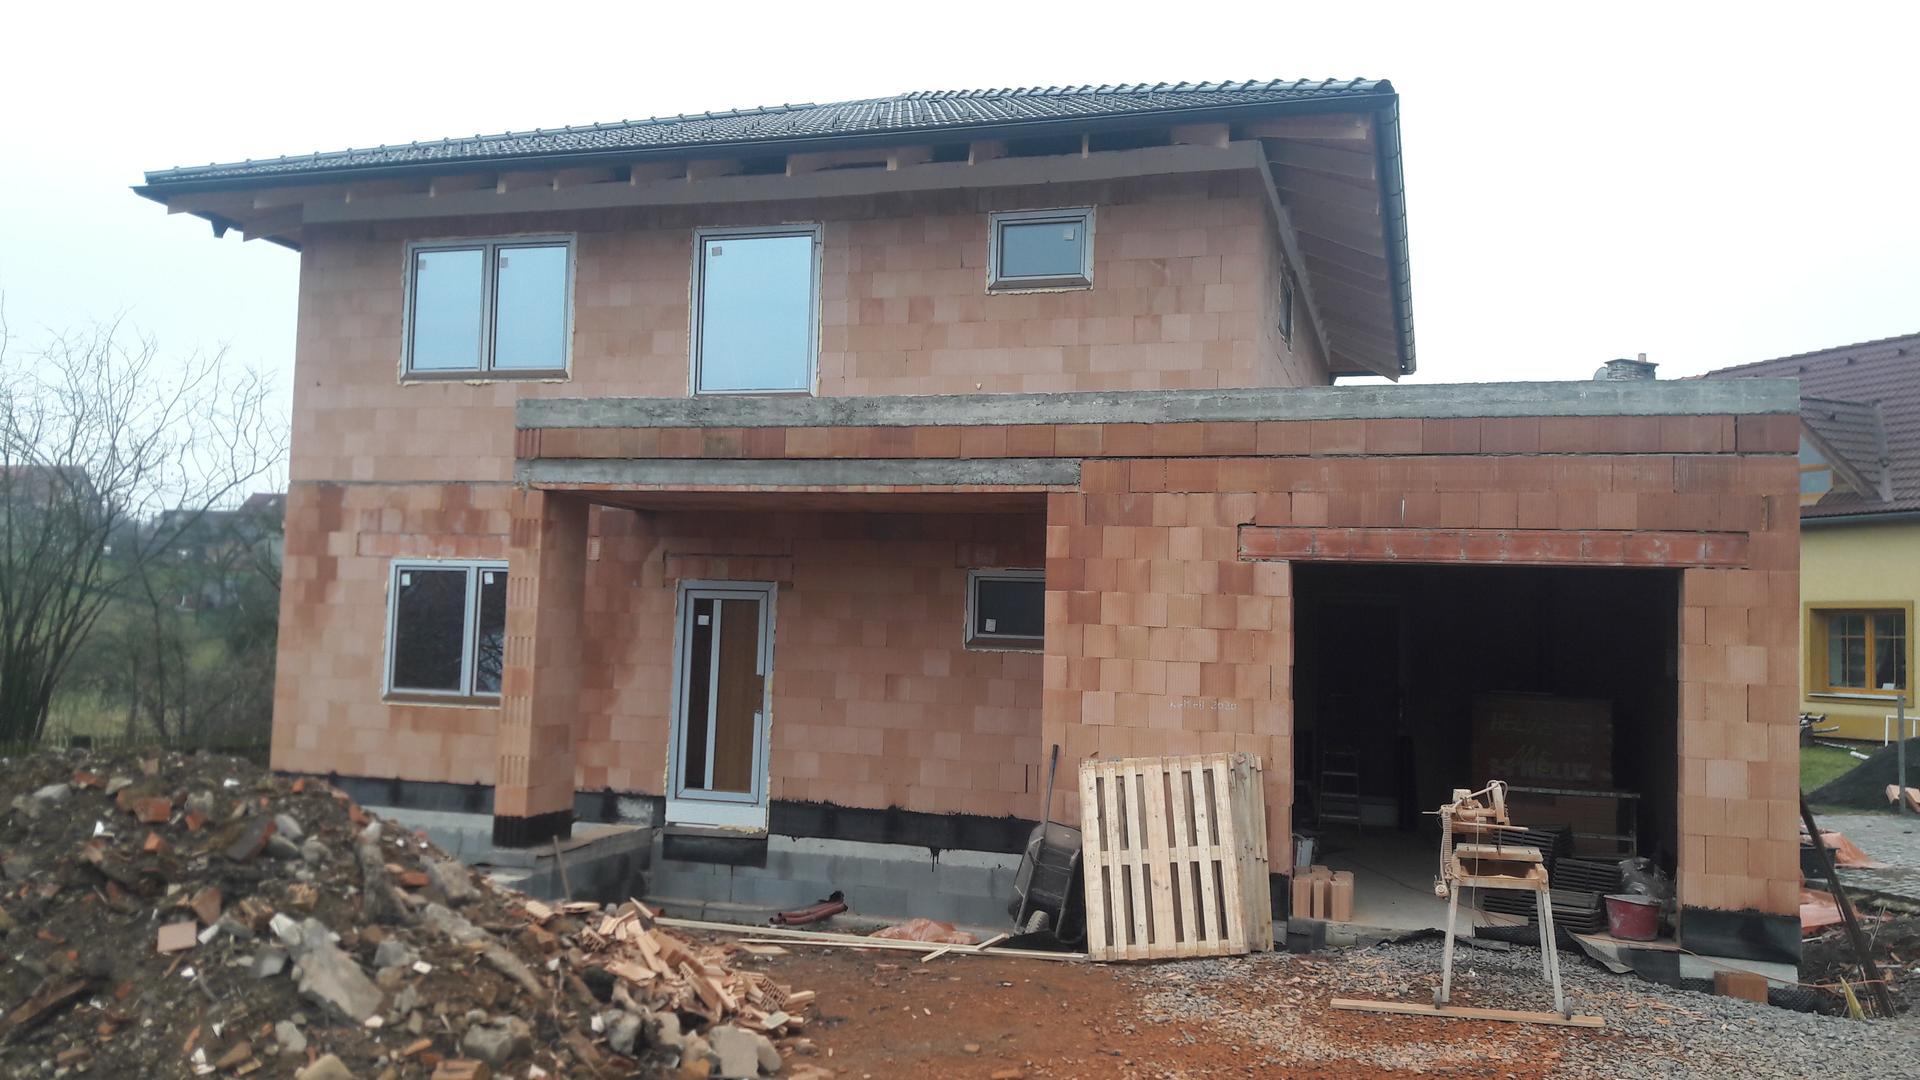 Náš domek - Obrázek č. 1